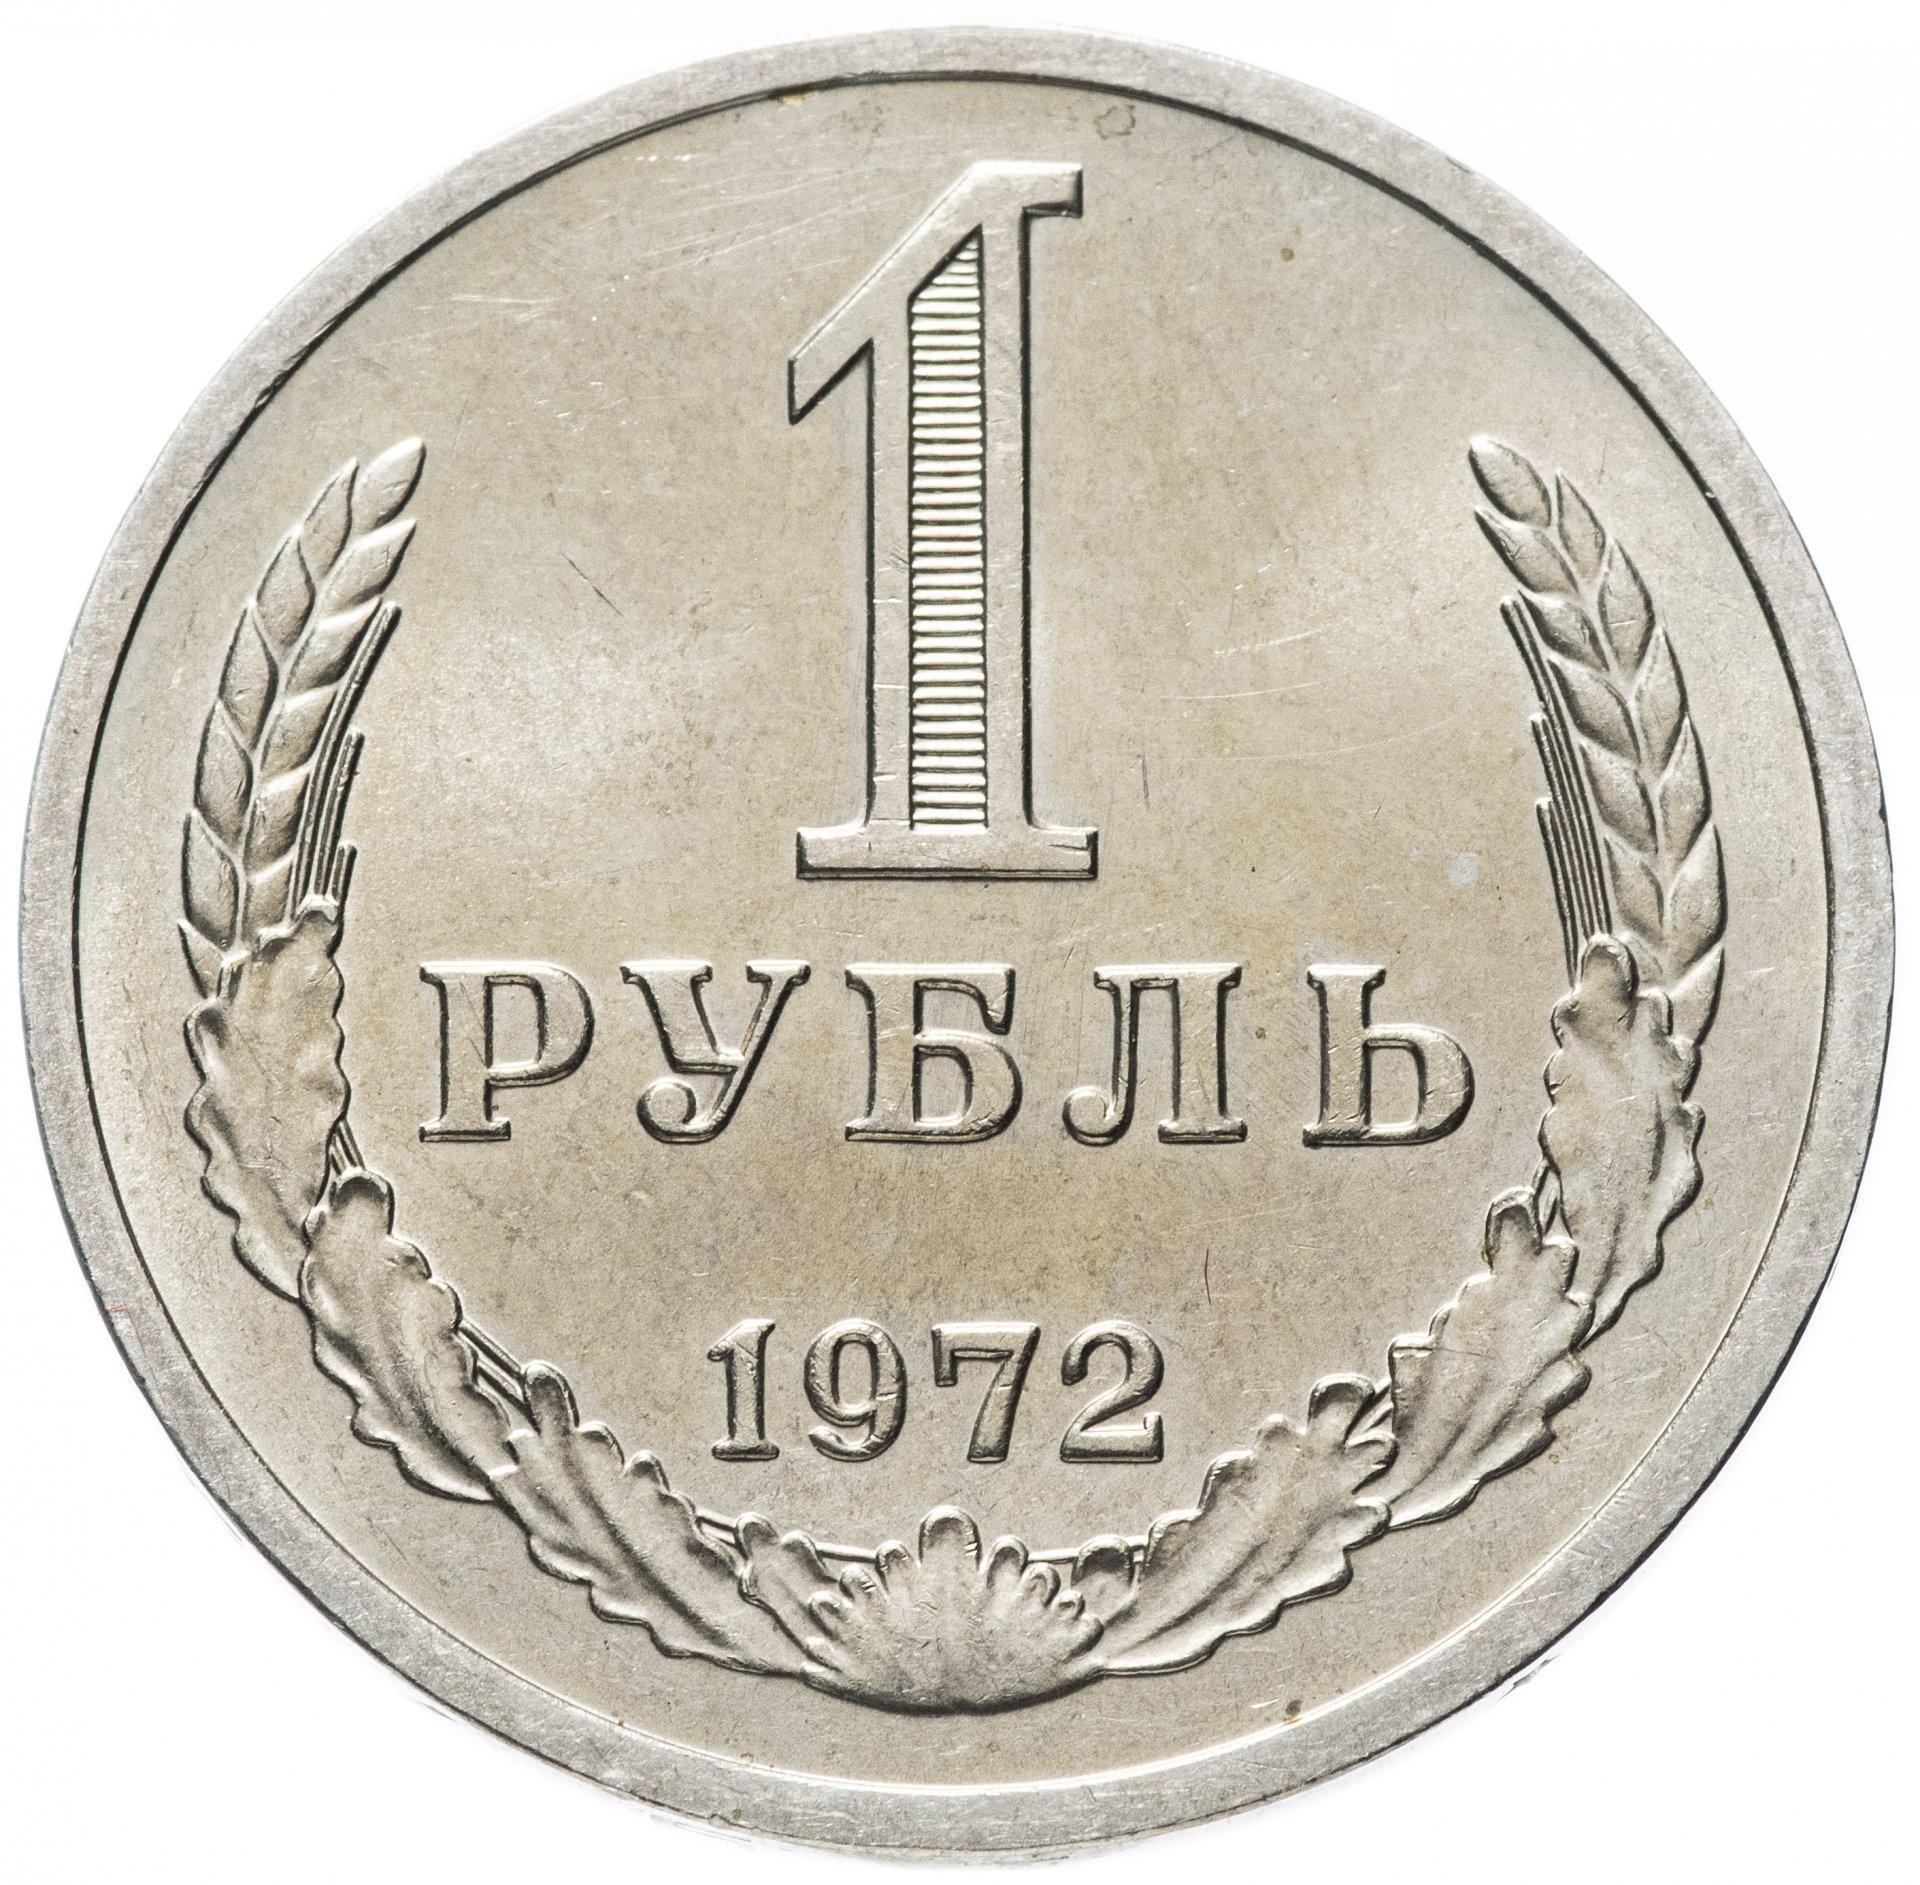 Картинка рубля и копейки